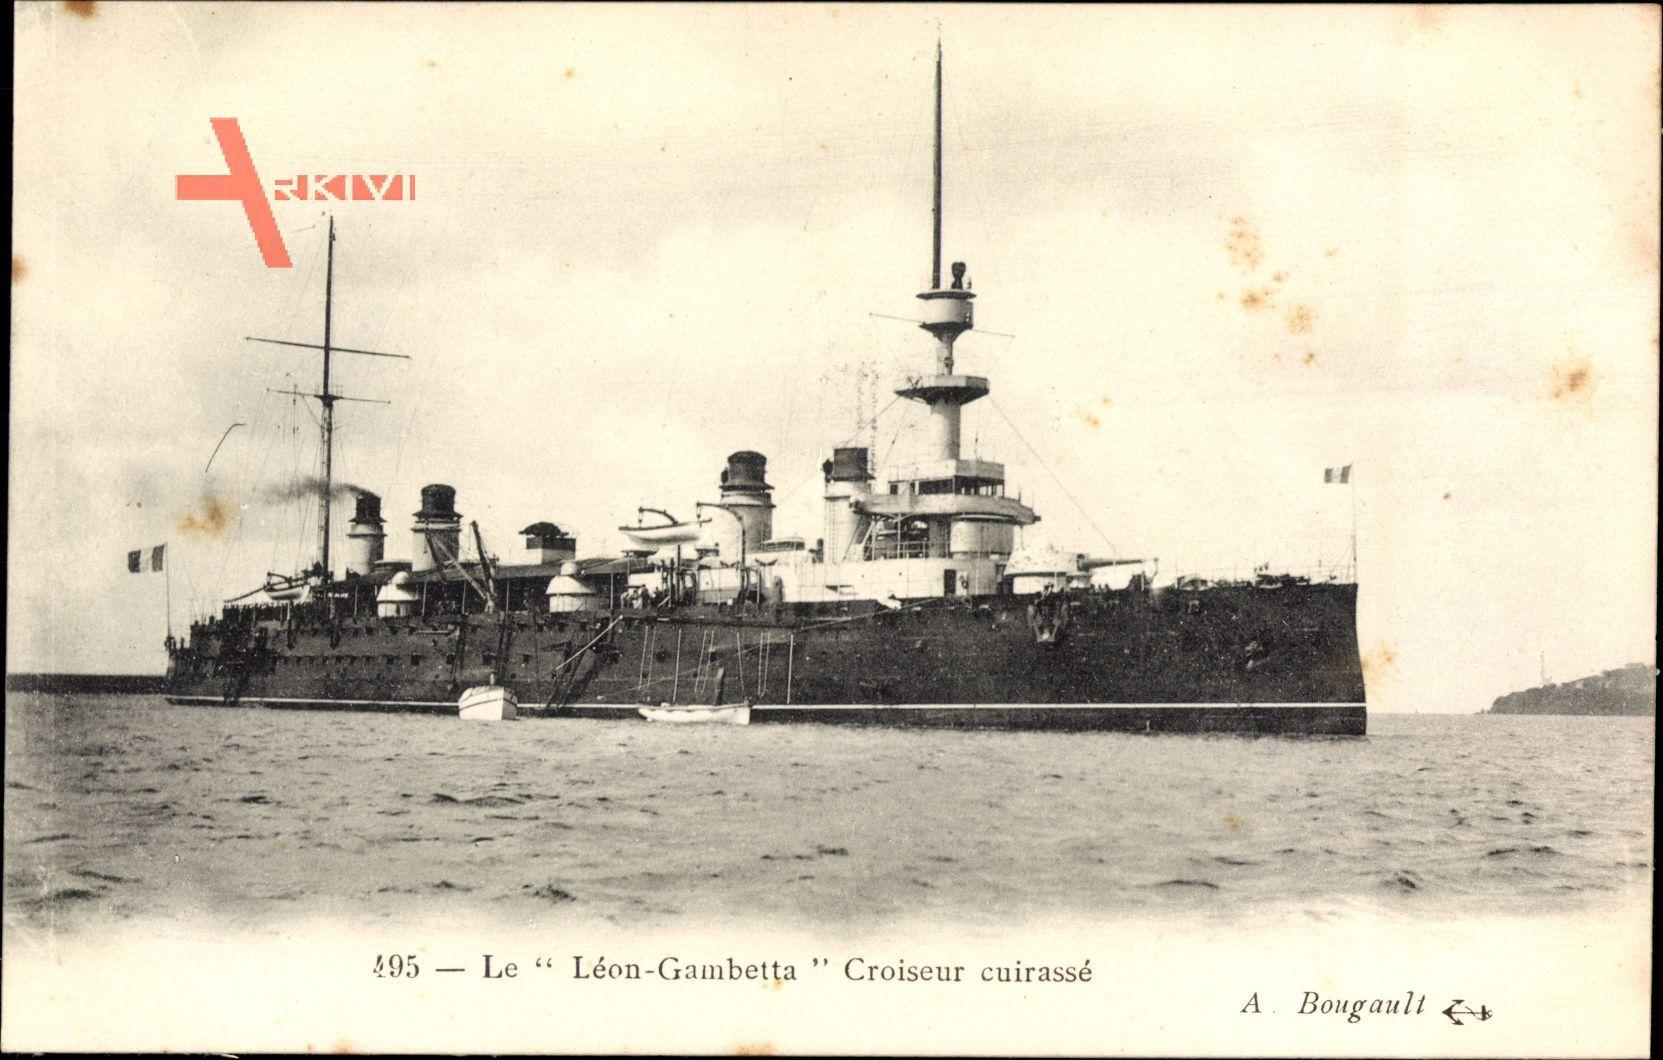 Französisches Kriegsschiff, Léon Gambetta, Croiseur cuirassé